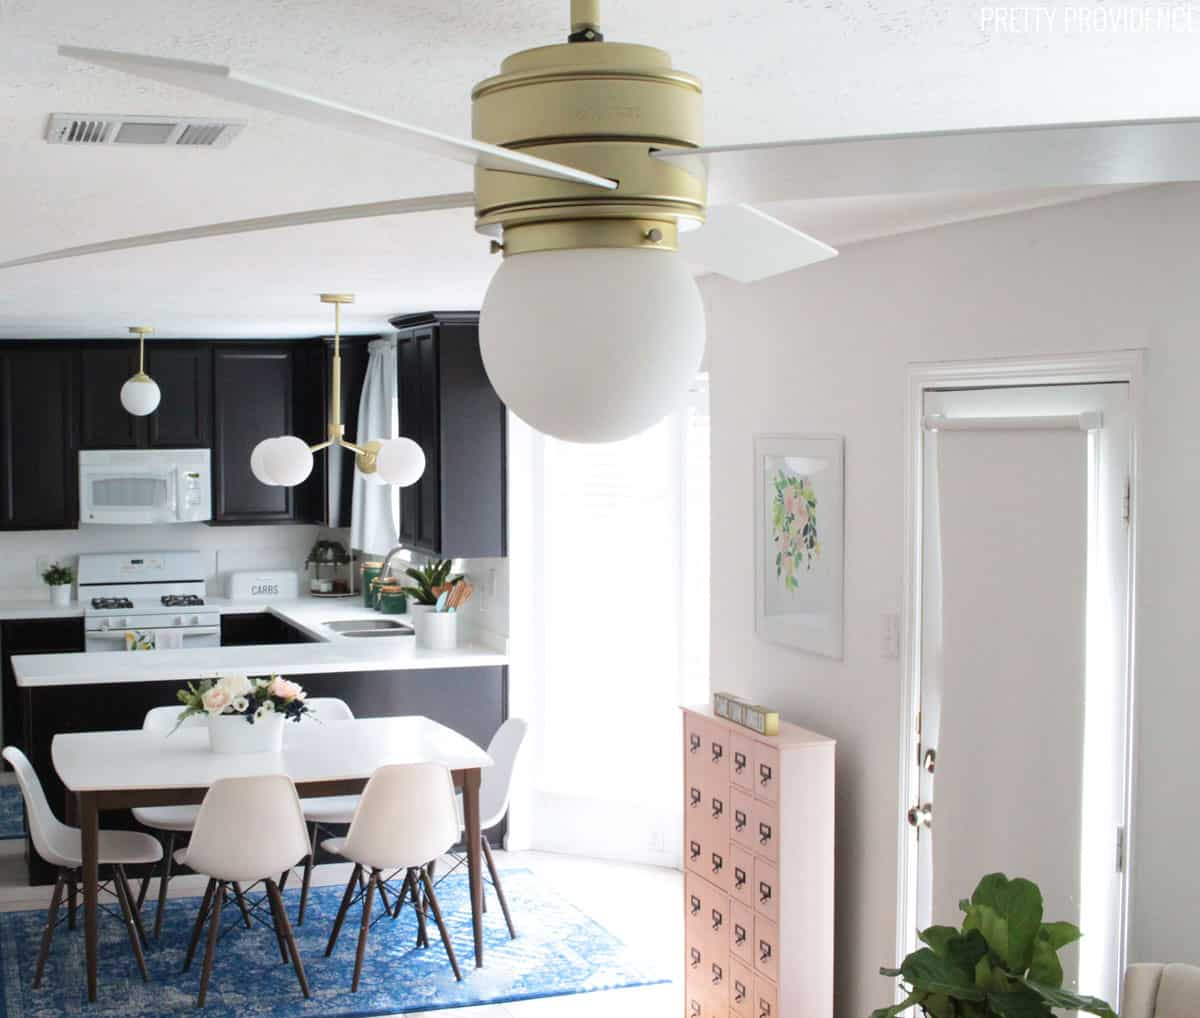 Hunter fan hepburn style with hepburn chandelier and pendant light in the background.